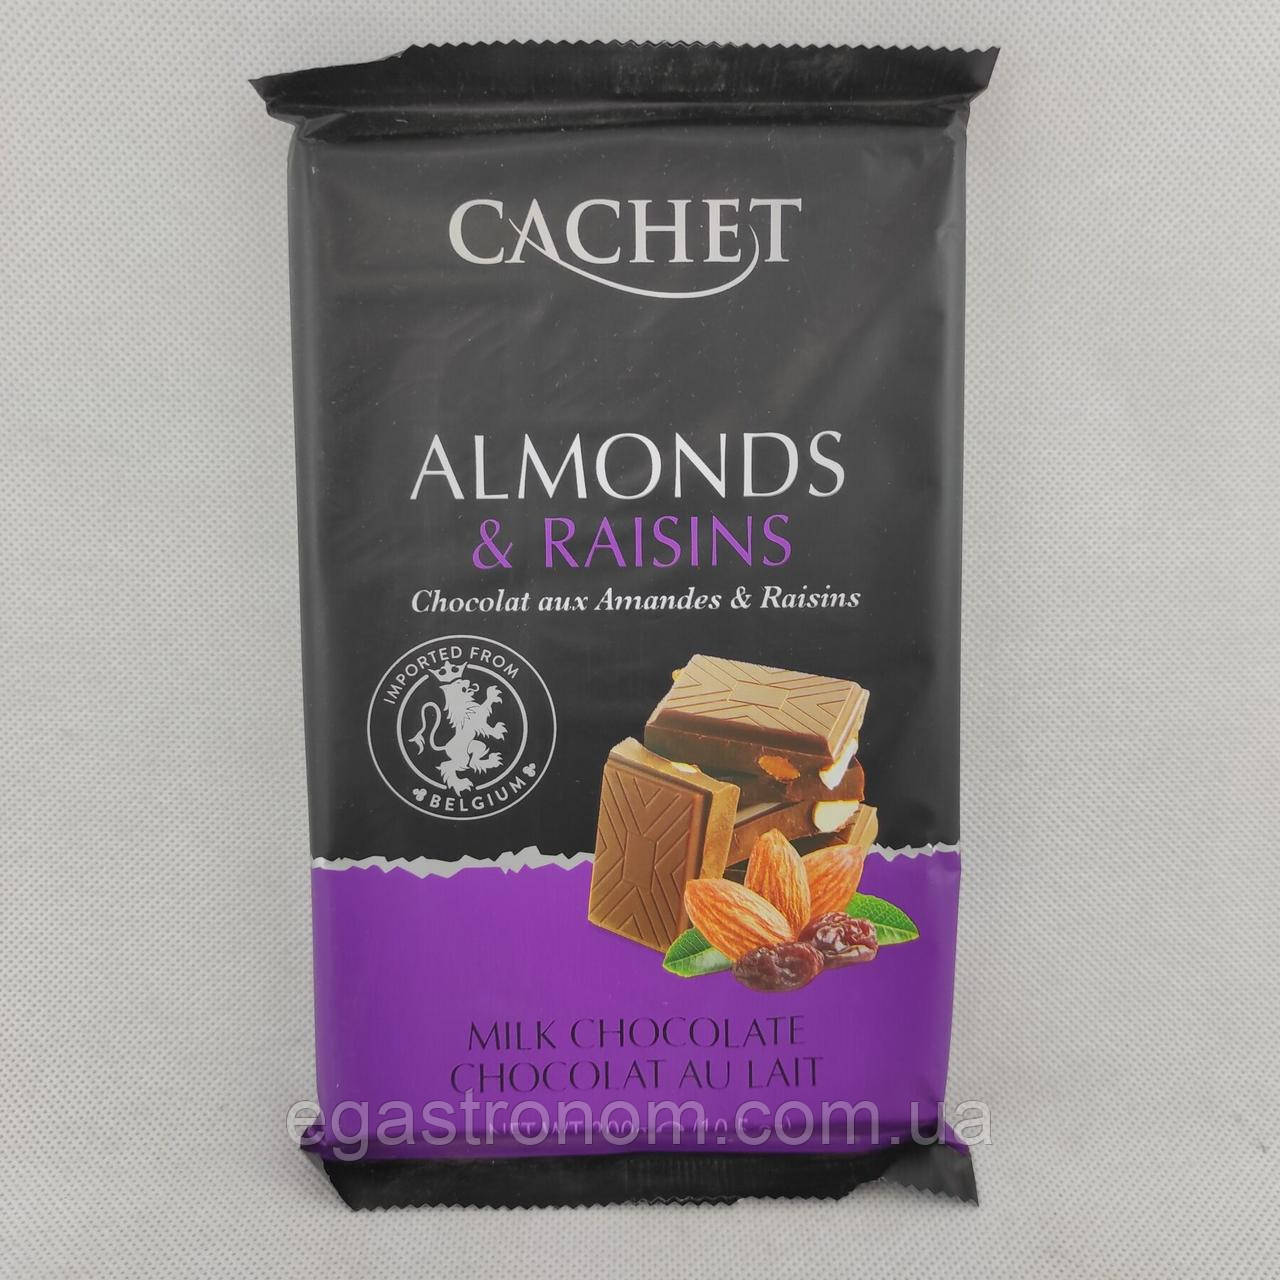 Шоколад Кашет №47 молочний шоколад з мигдалем і родзинками Cashet almonds & raisins 300g 12шт/ящ (Код : 00-00004147)